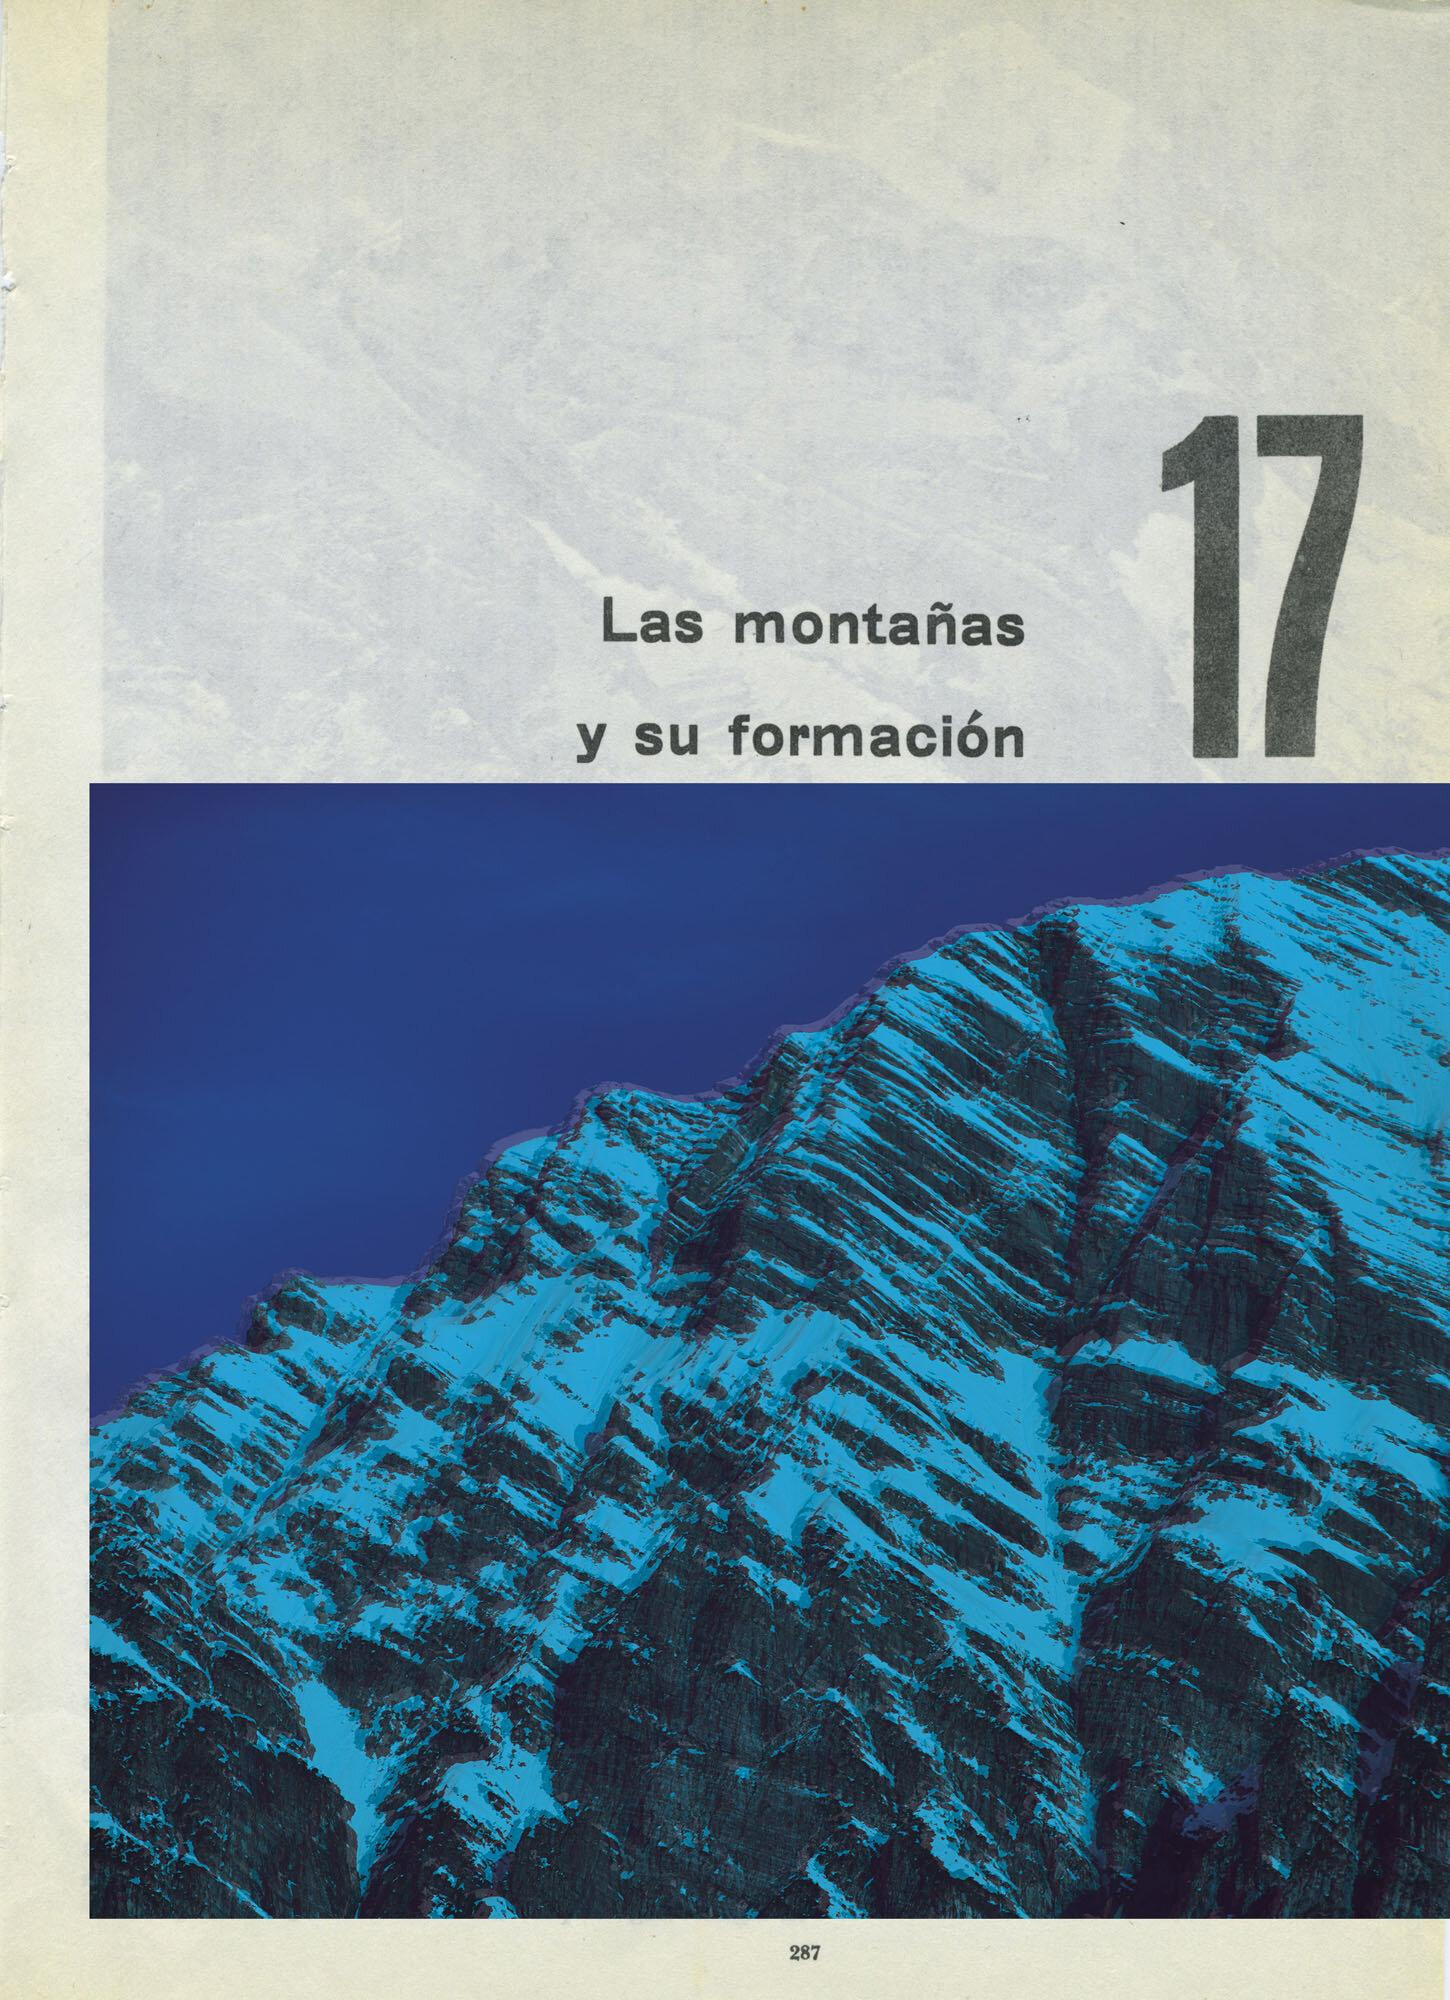 190205 NoA MountainFormation 1.jpg